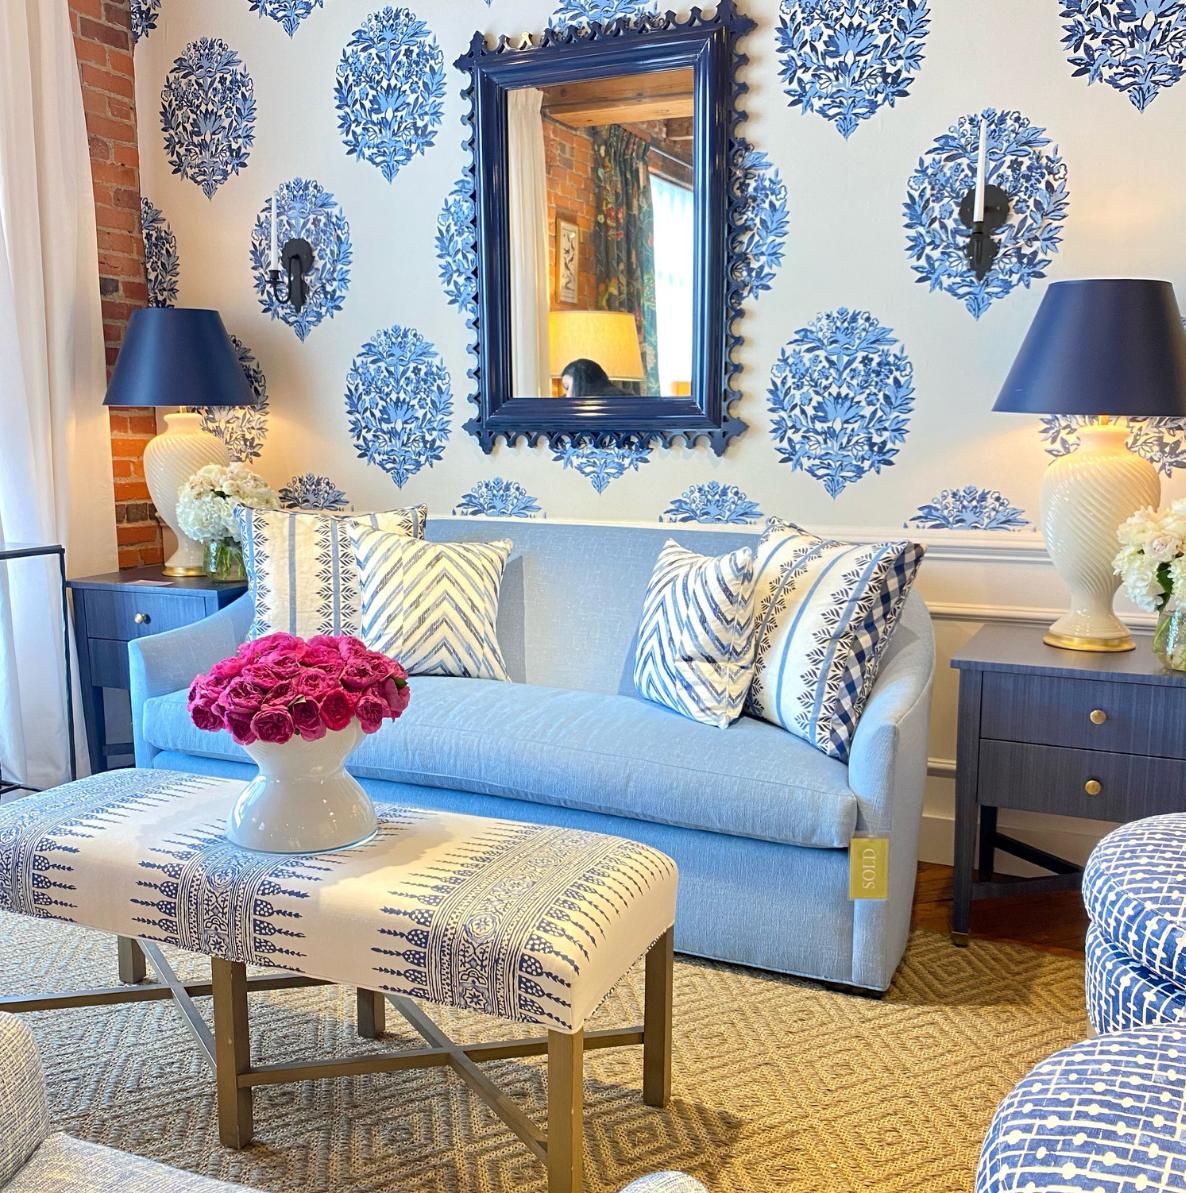 superior-construction-lebanon-tn-select-durable-fabrics-colorful-patterned-vingette-of-living-room-setup